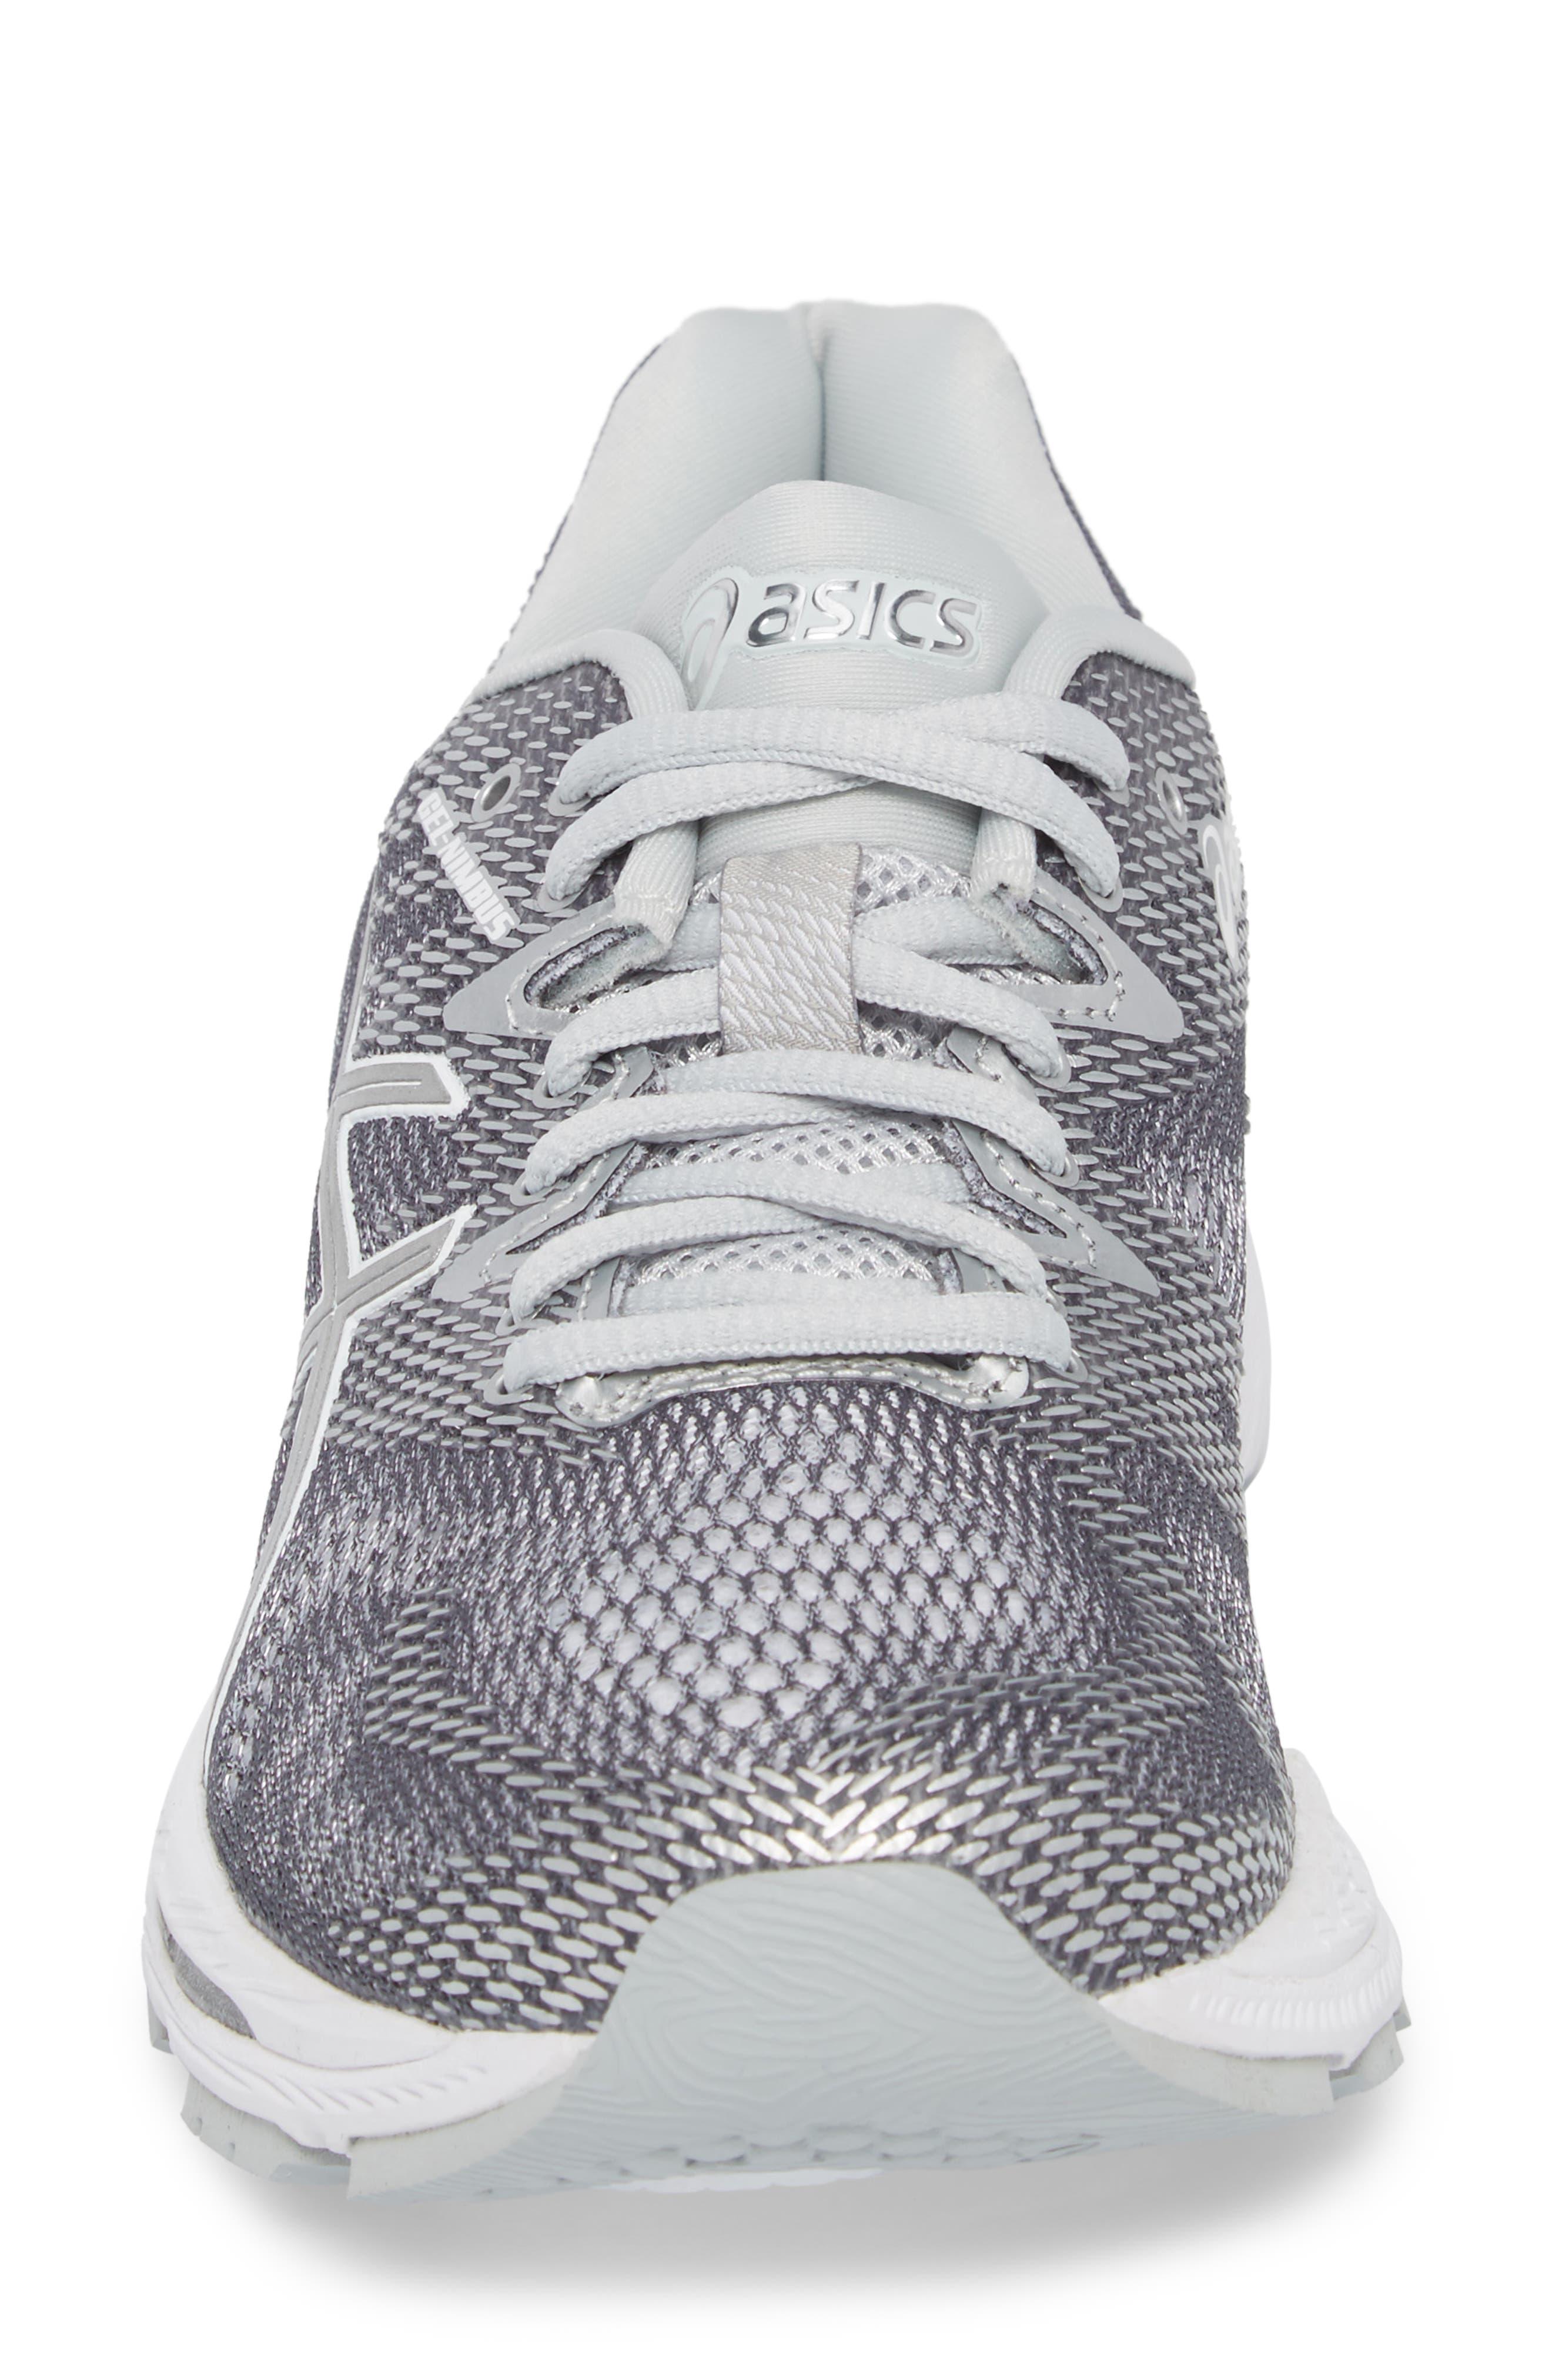 GEL-Nimbus 20 Platinum Running Shoe,                             Alternate thumbnail 4, color,                             097